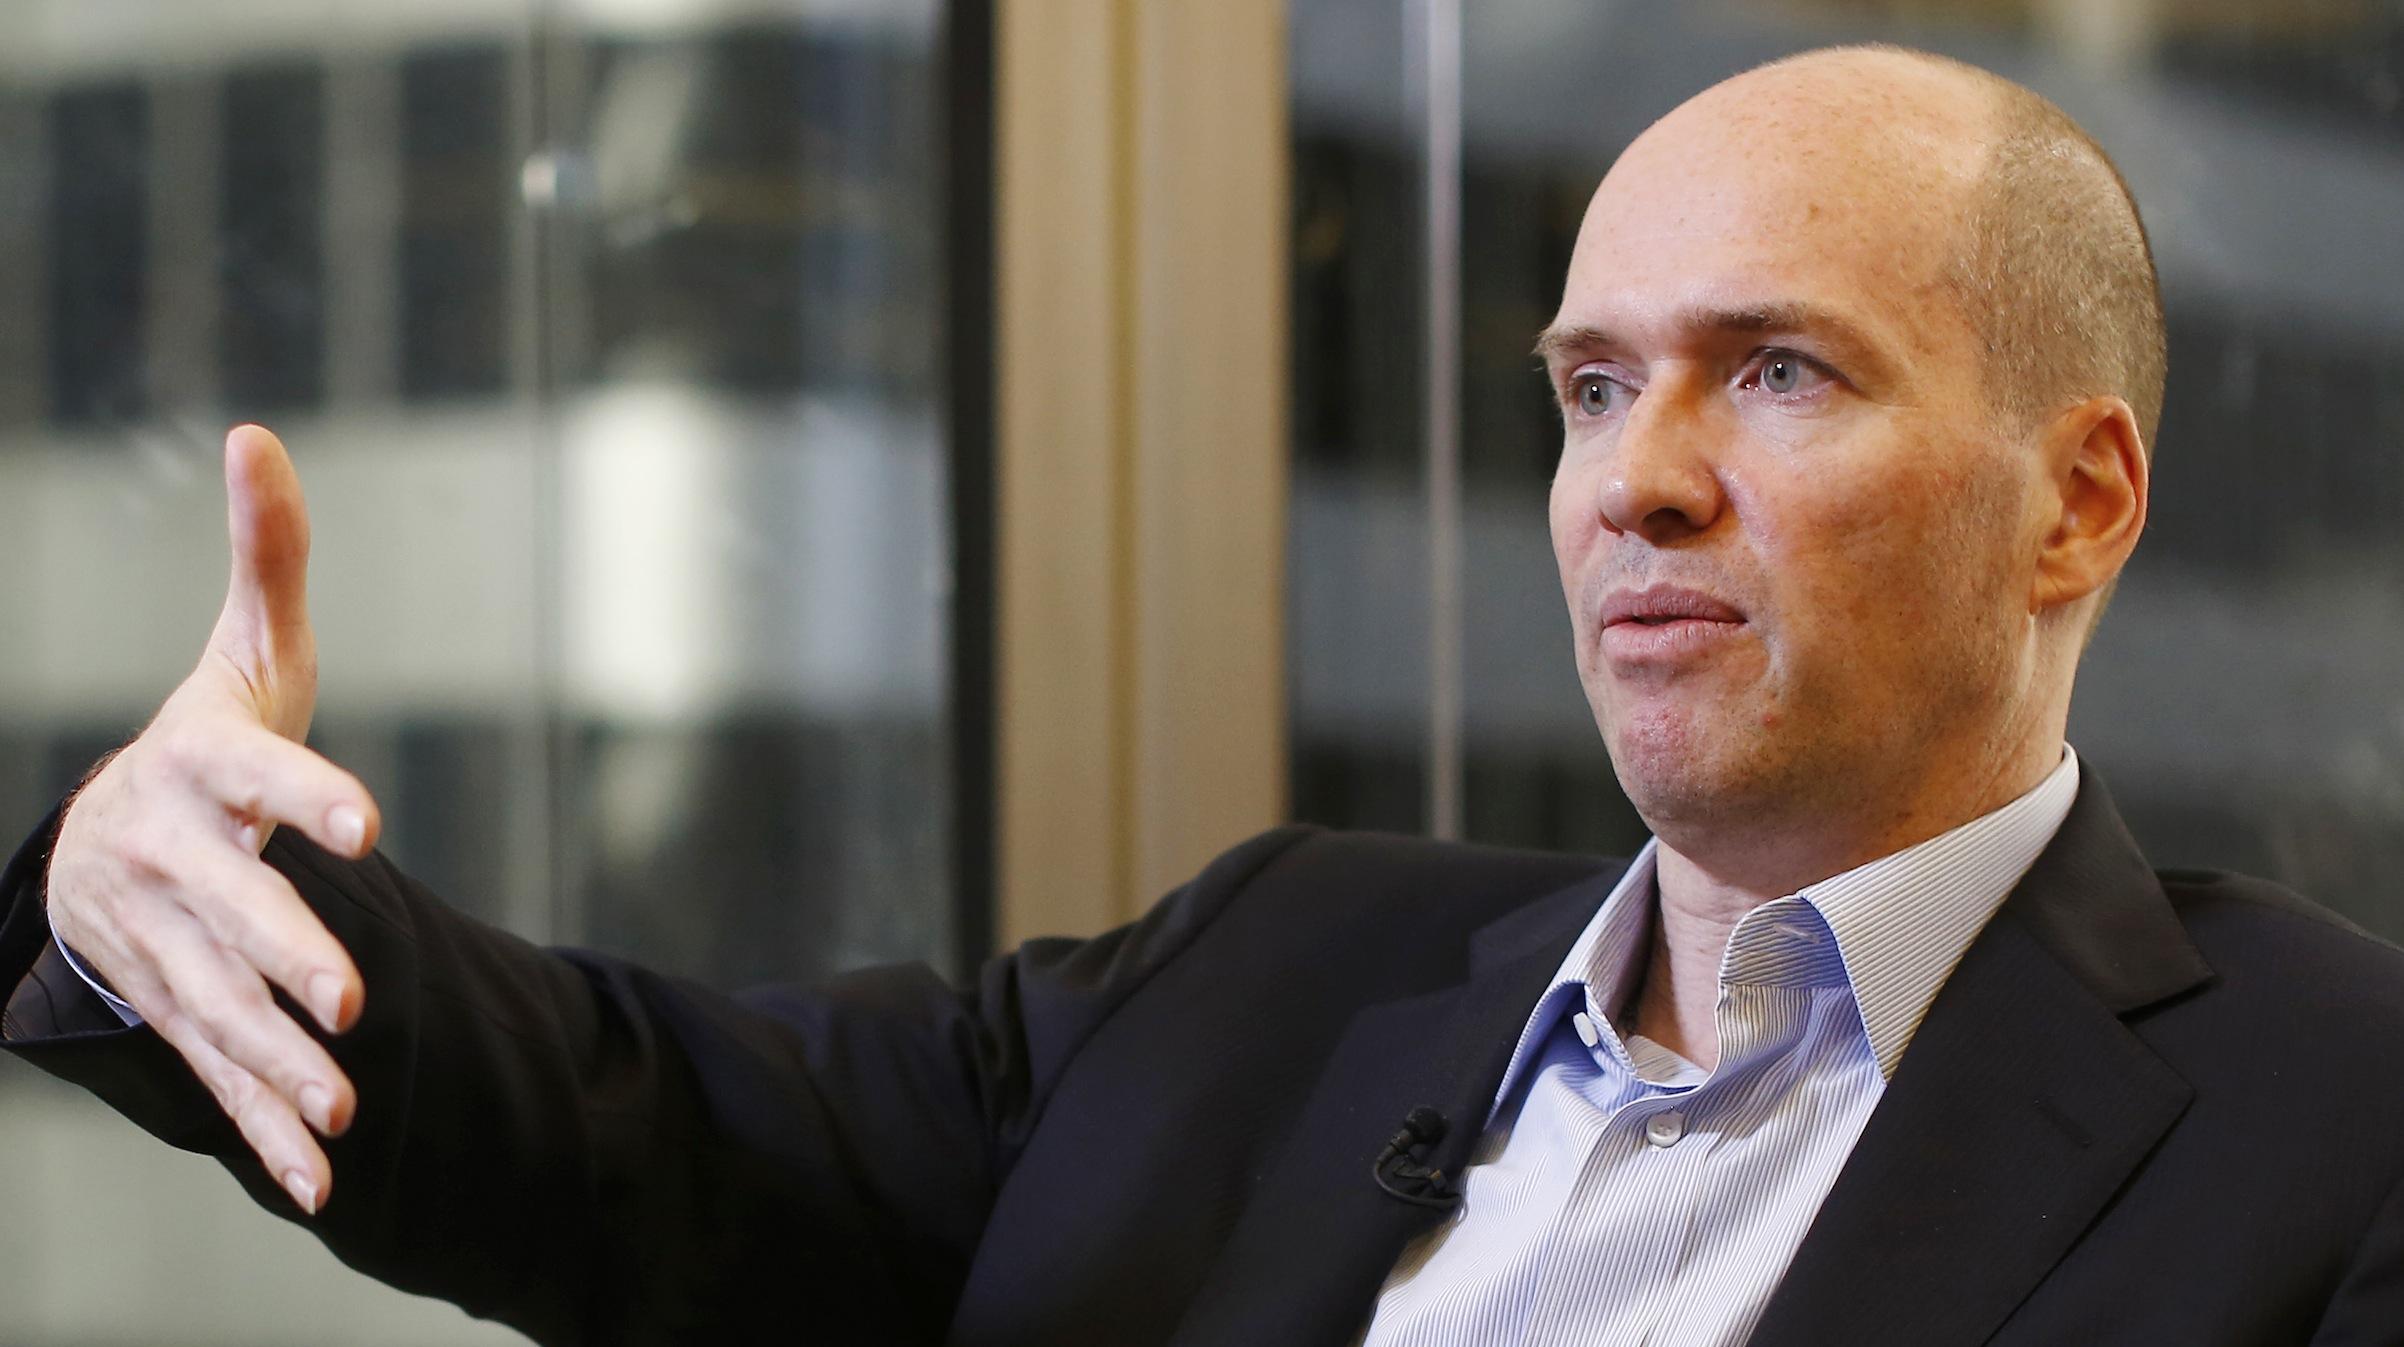 Ben Horowitz, General Partner at Andreessen Horowitz, speaks during the Reuters Global Technology Summit in San Francisco